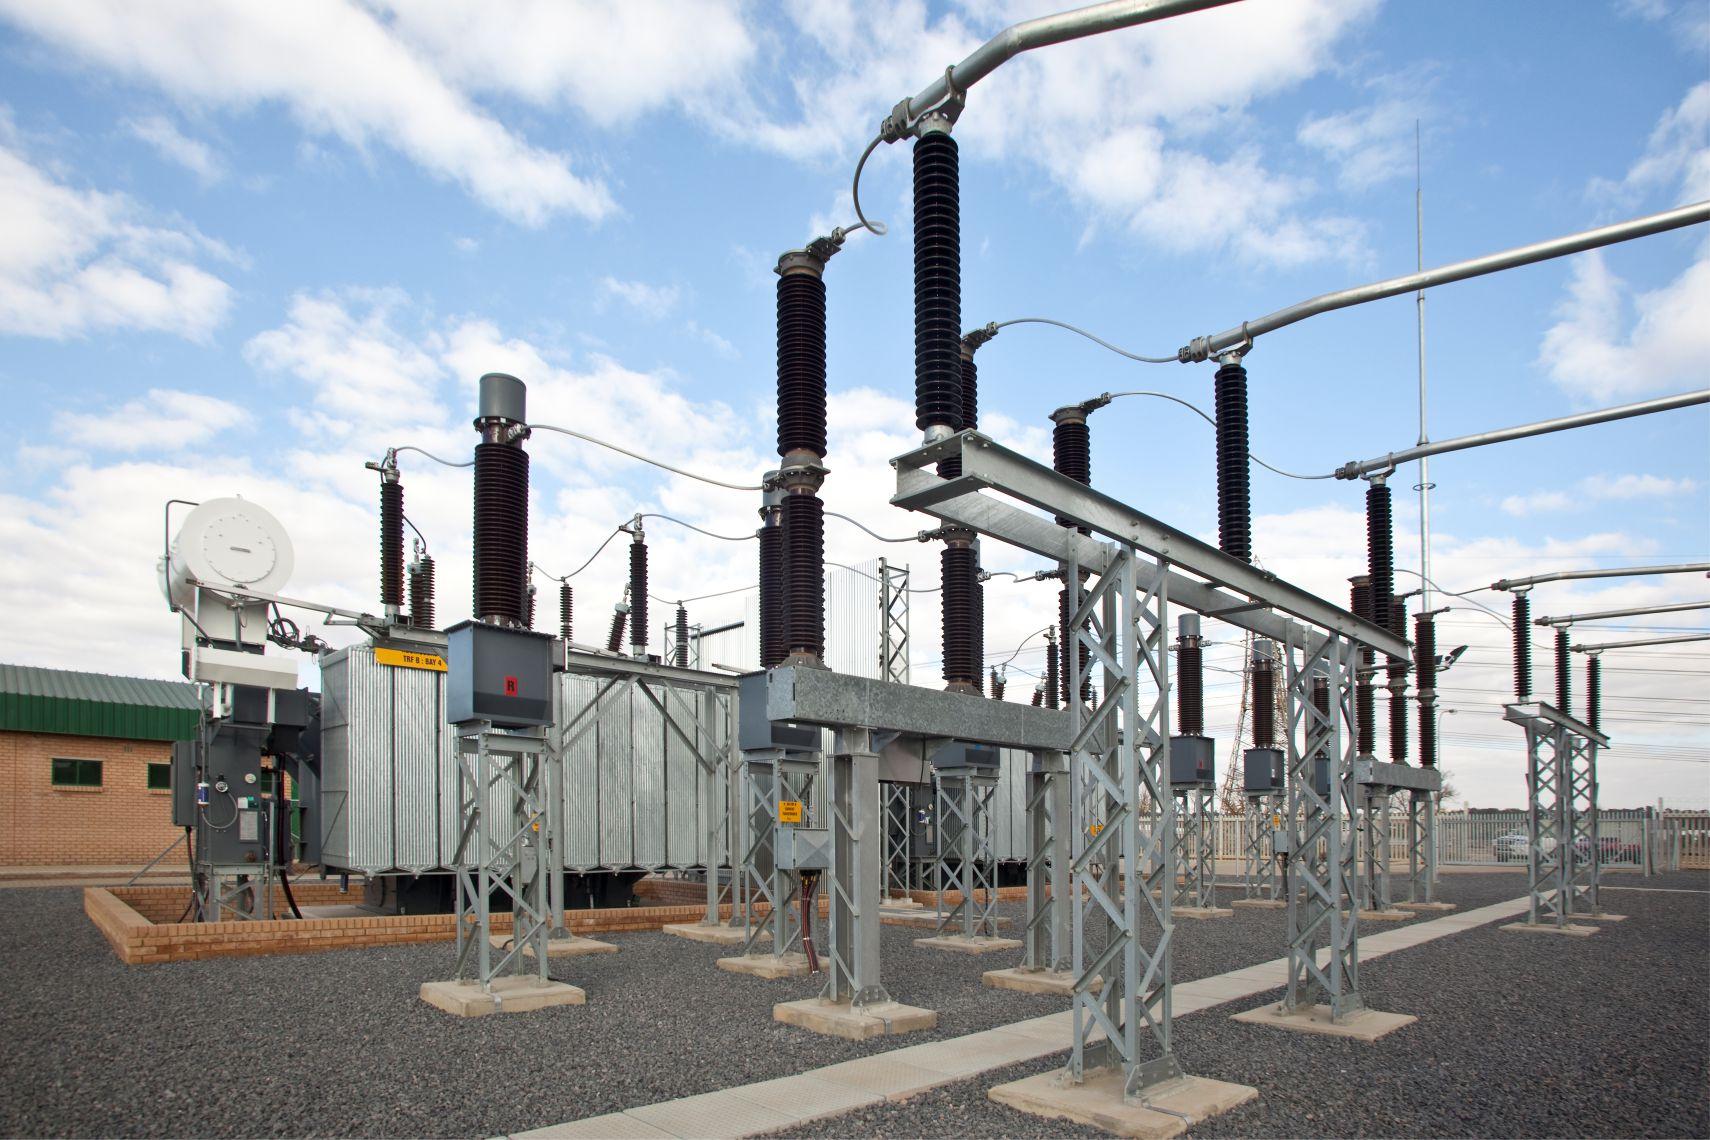 Korean Power Utilities